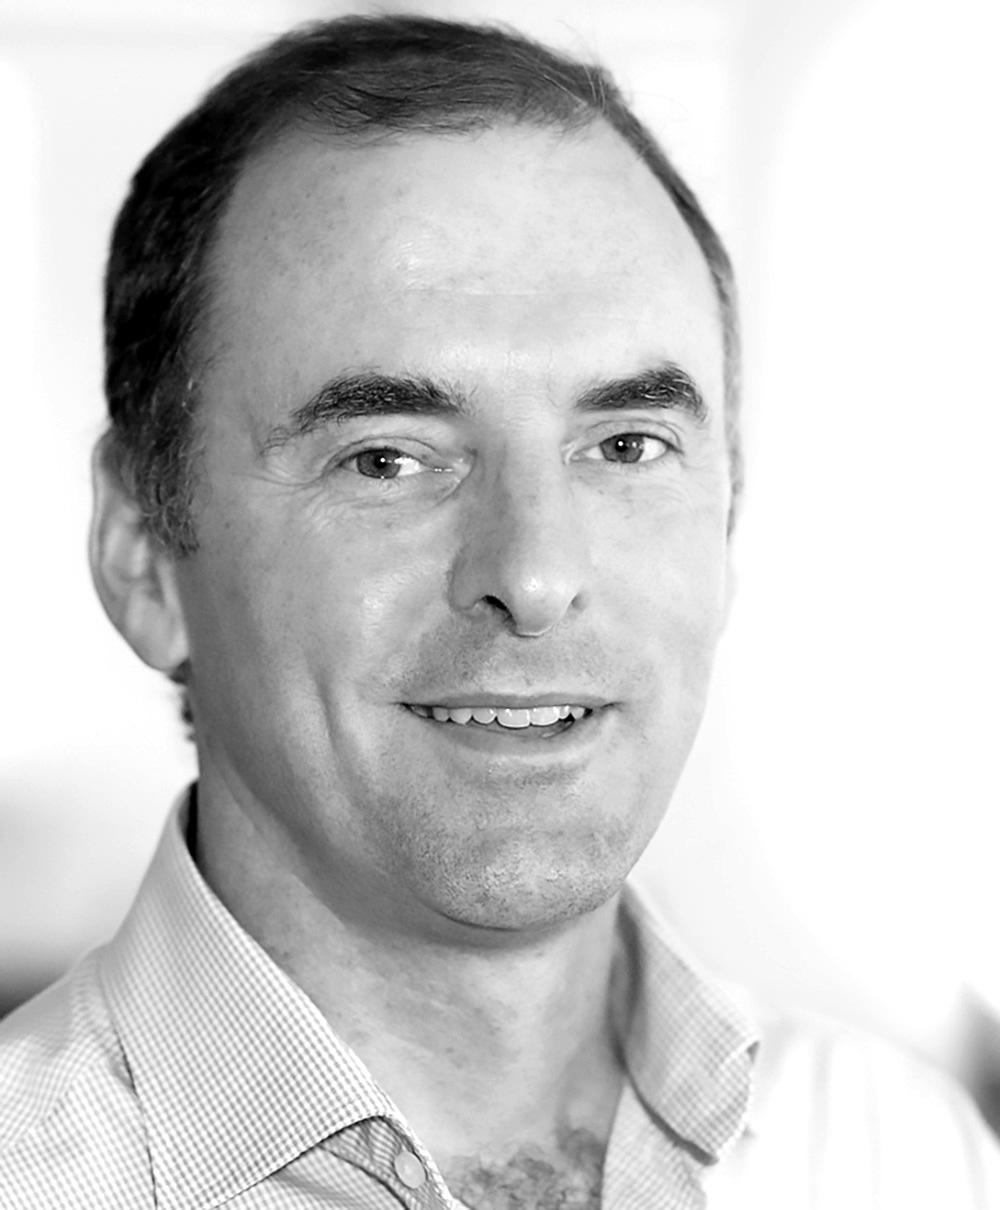 Headshot of Stephen O'Brien